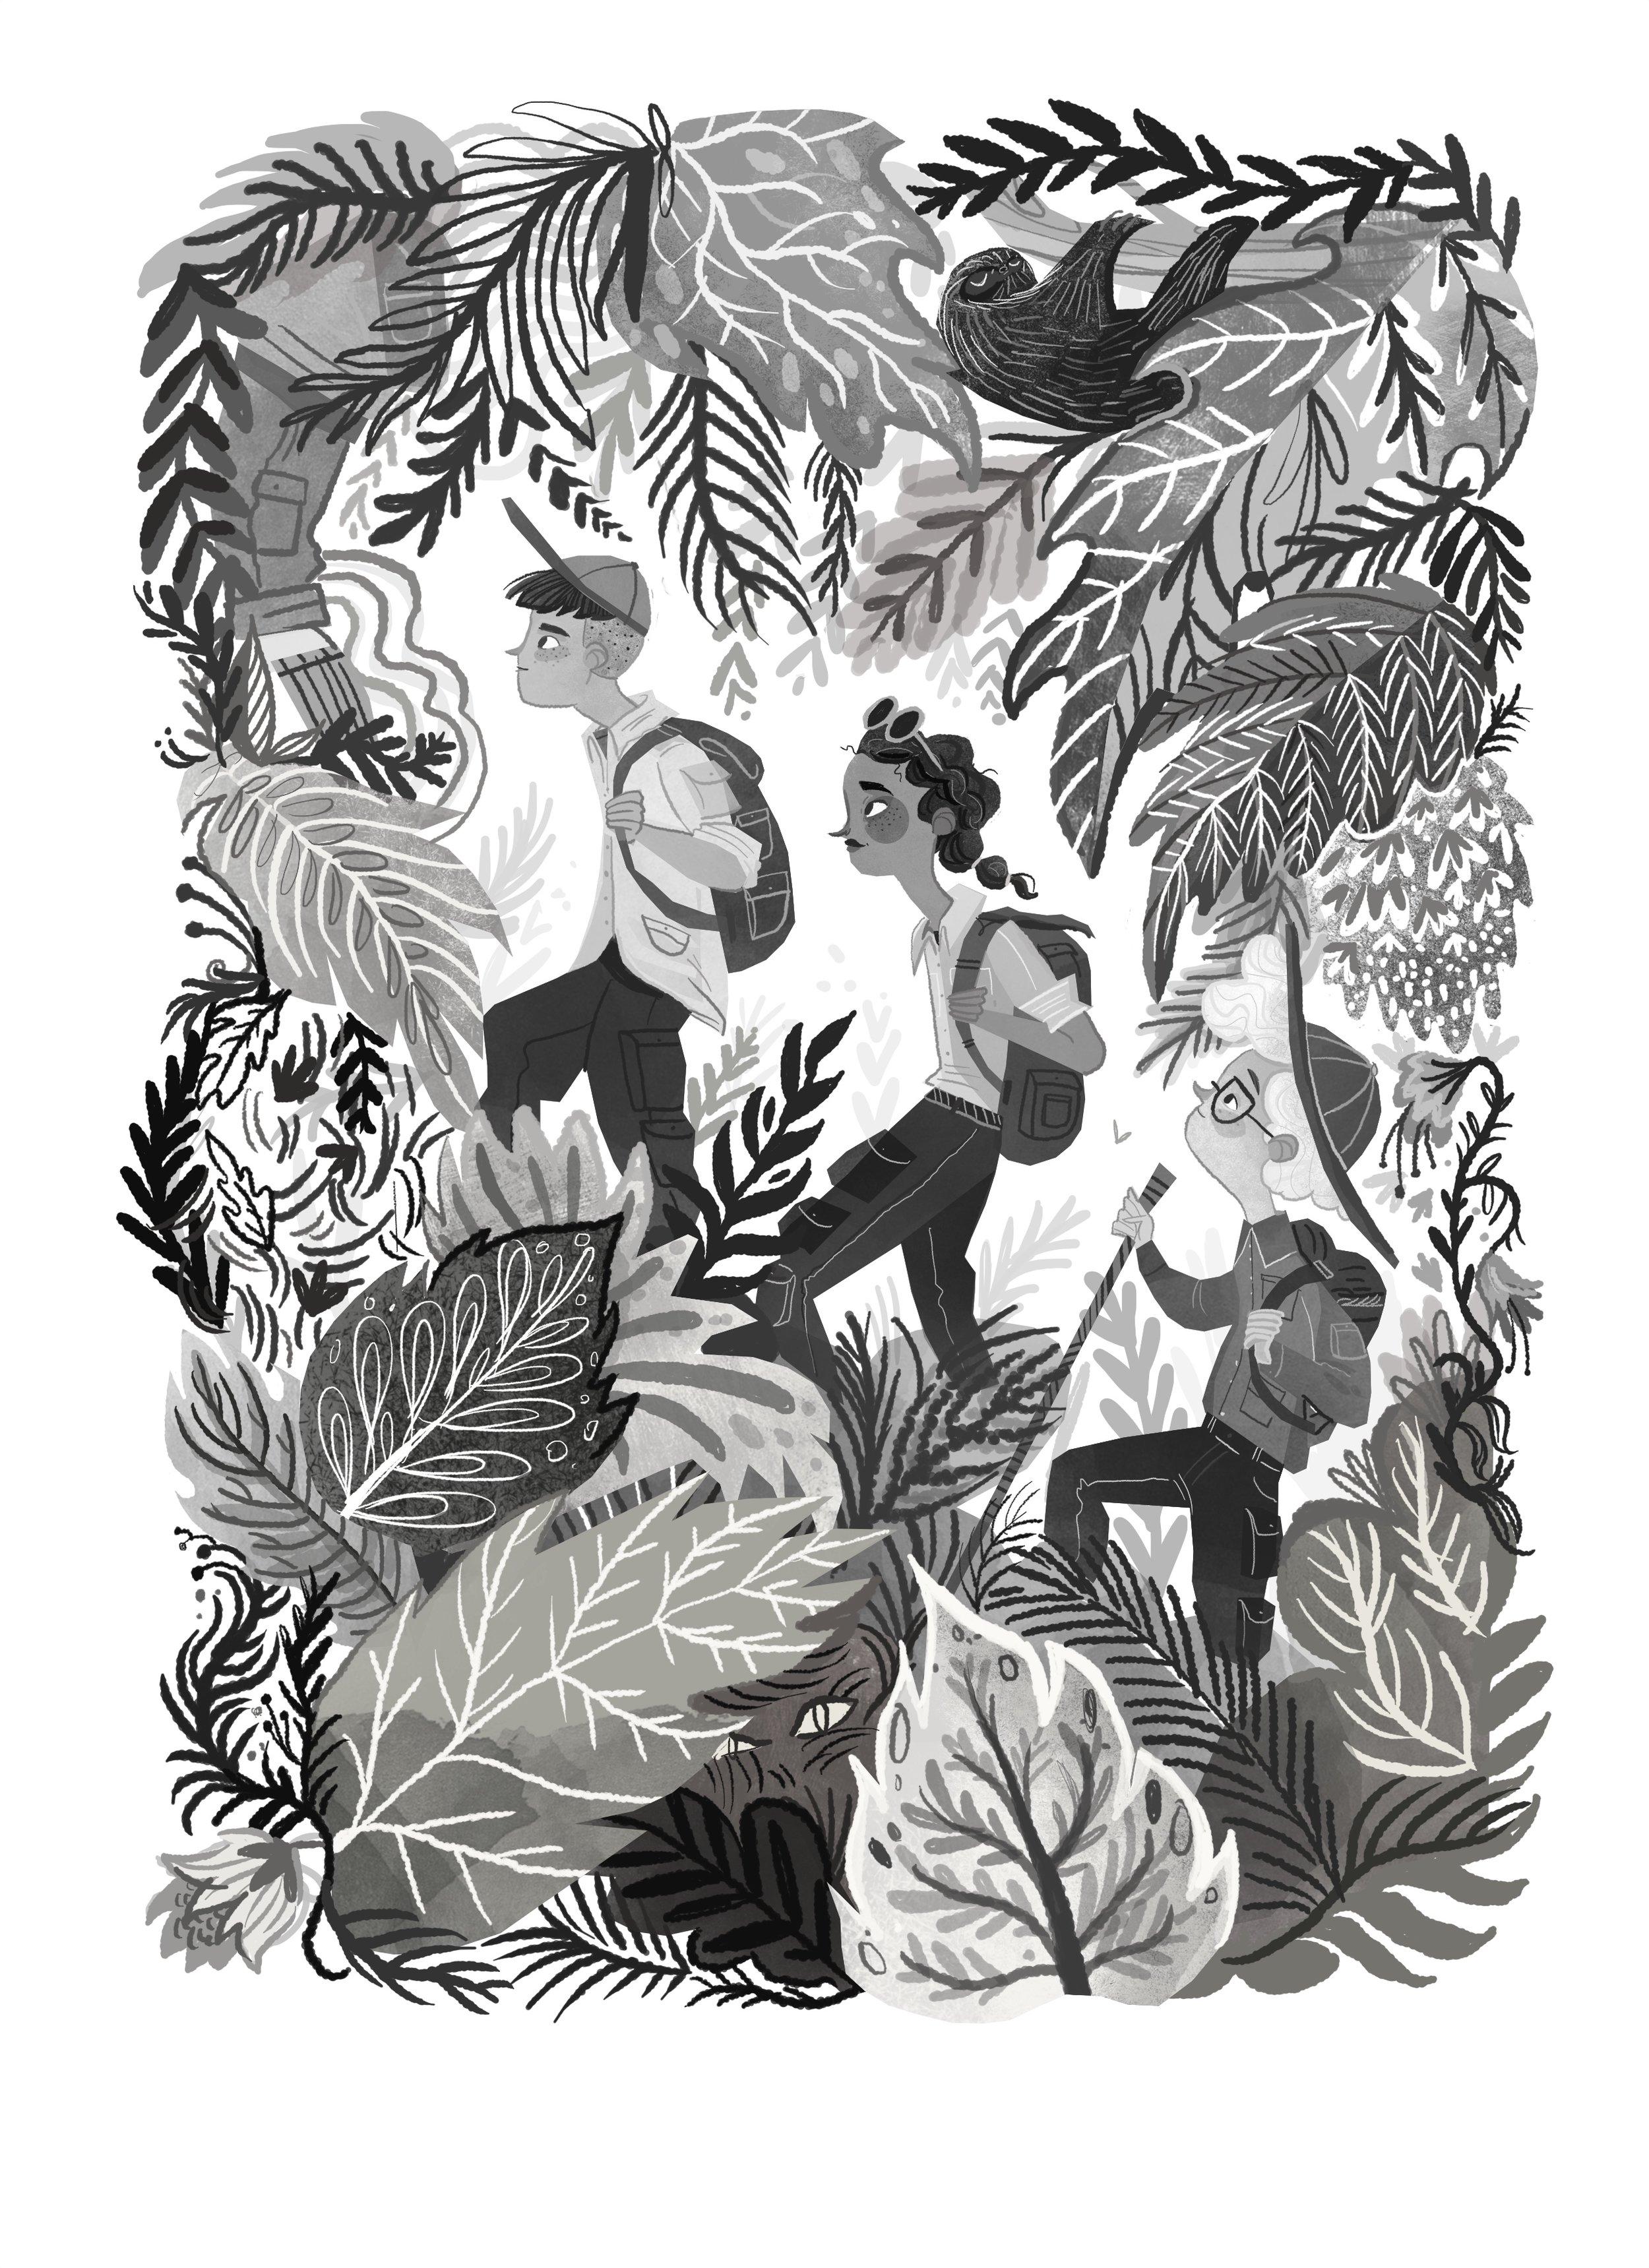 Internal illustration from  Battle of the Beetles  by Karl James Mountford